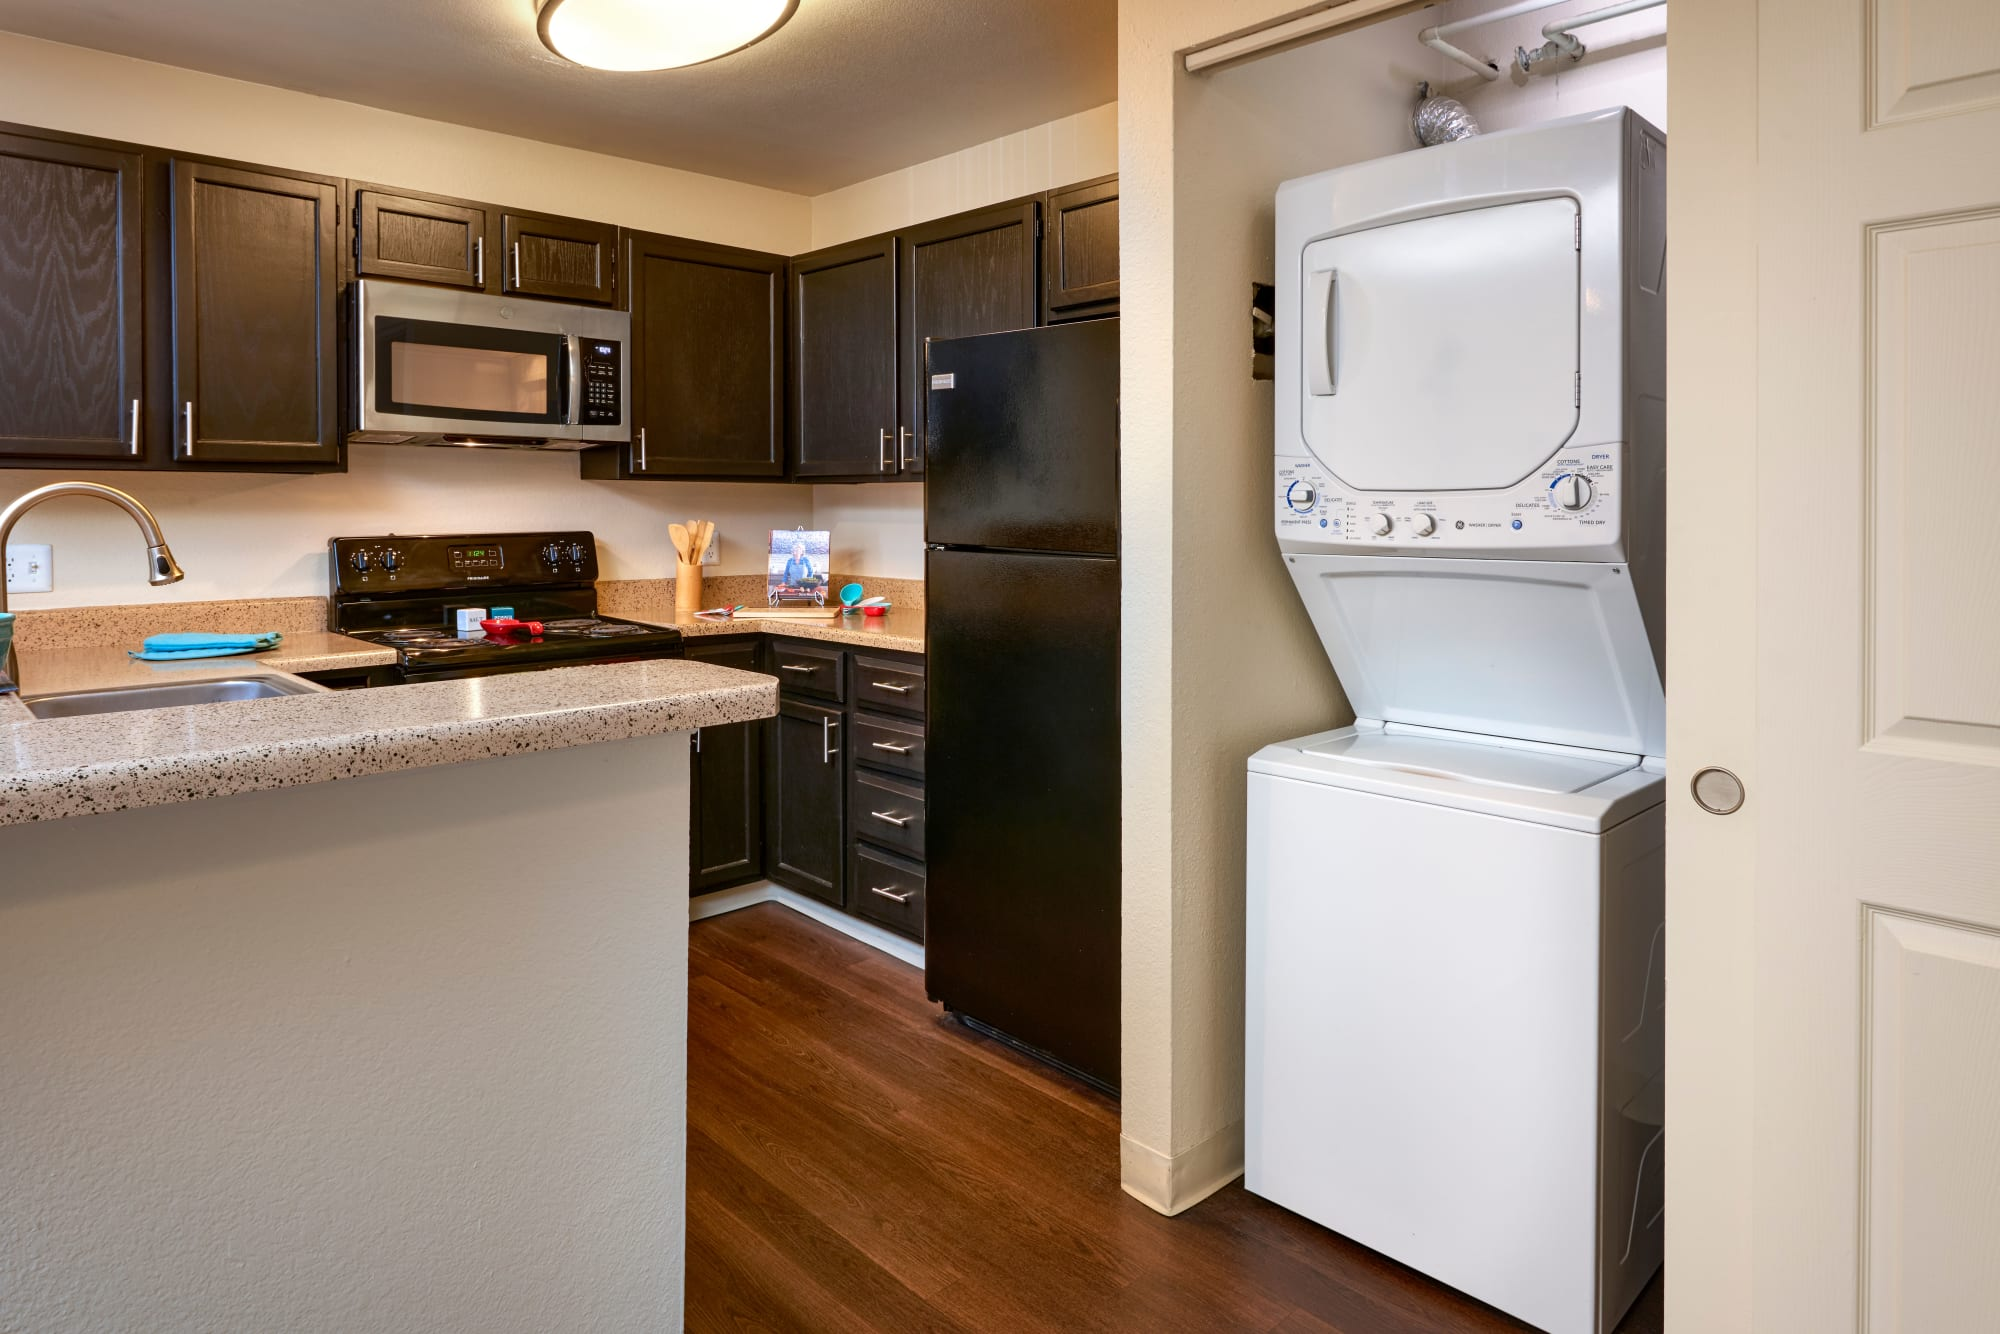 Washer/Dryer and Kitchen